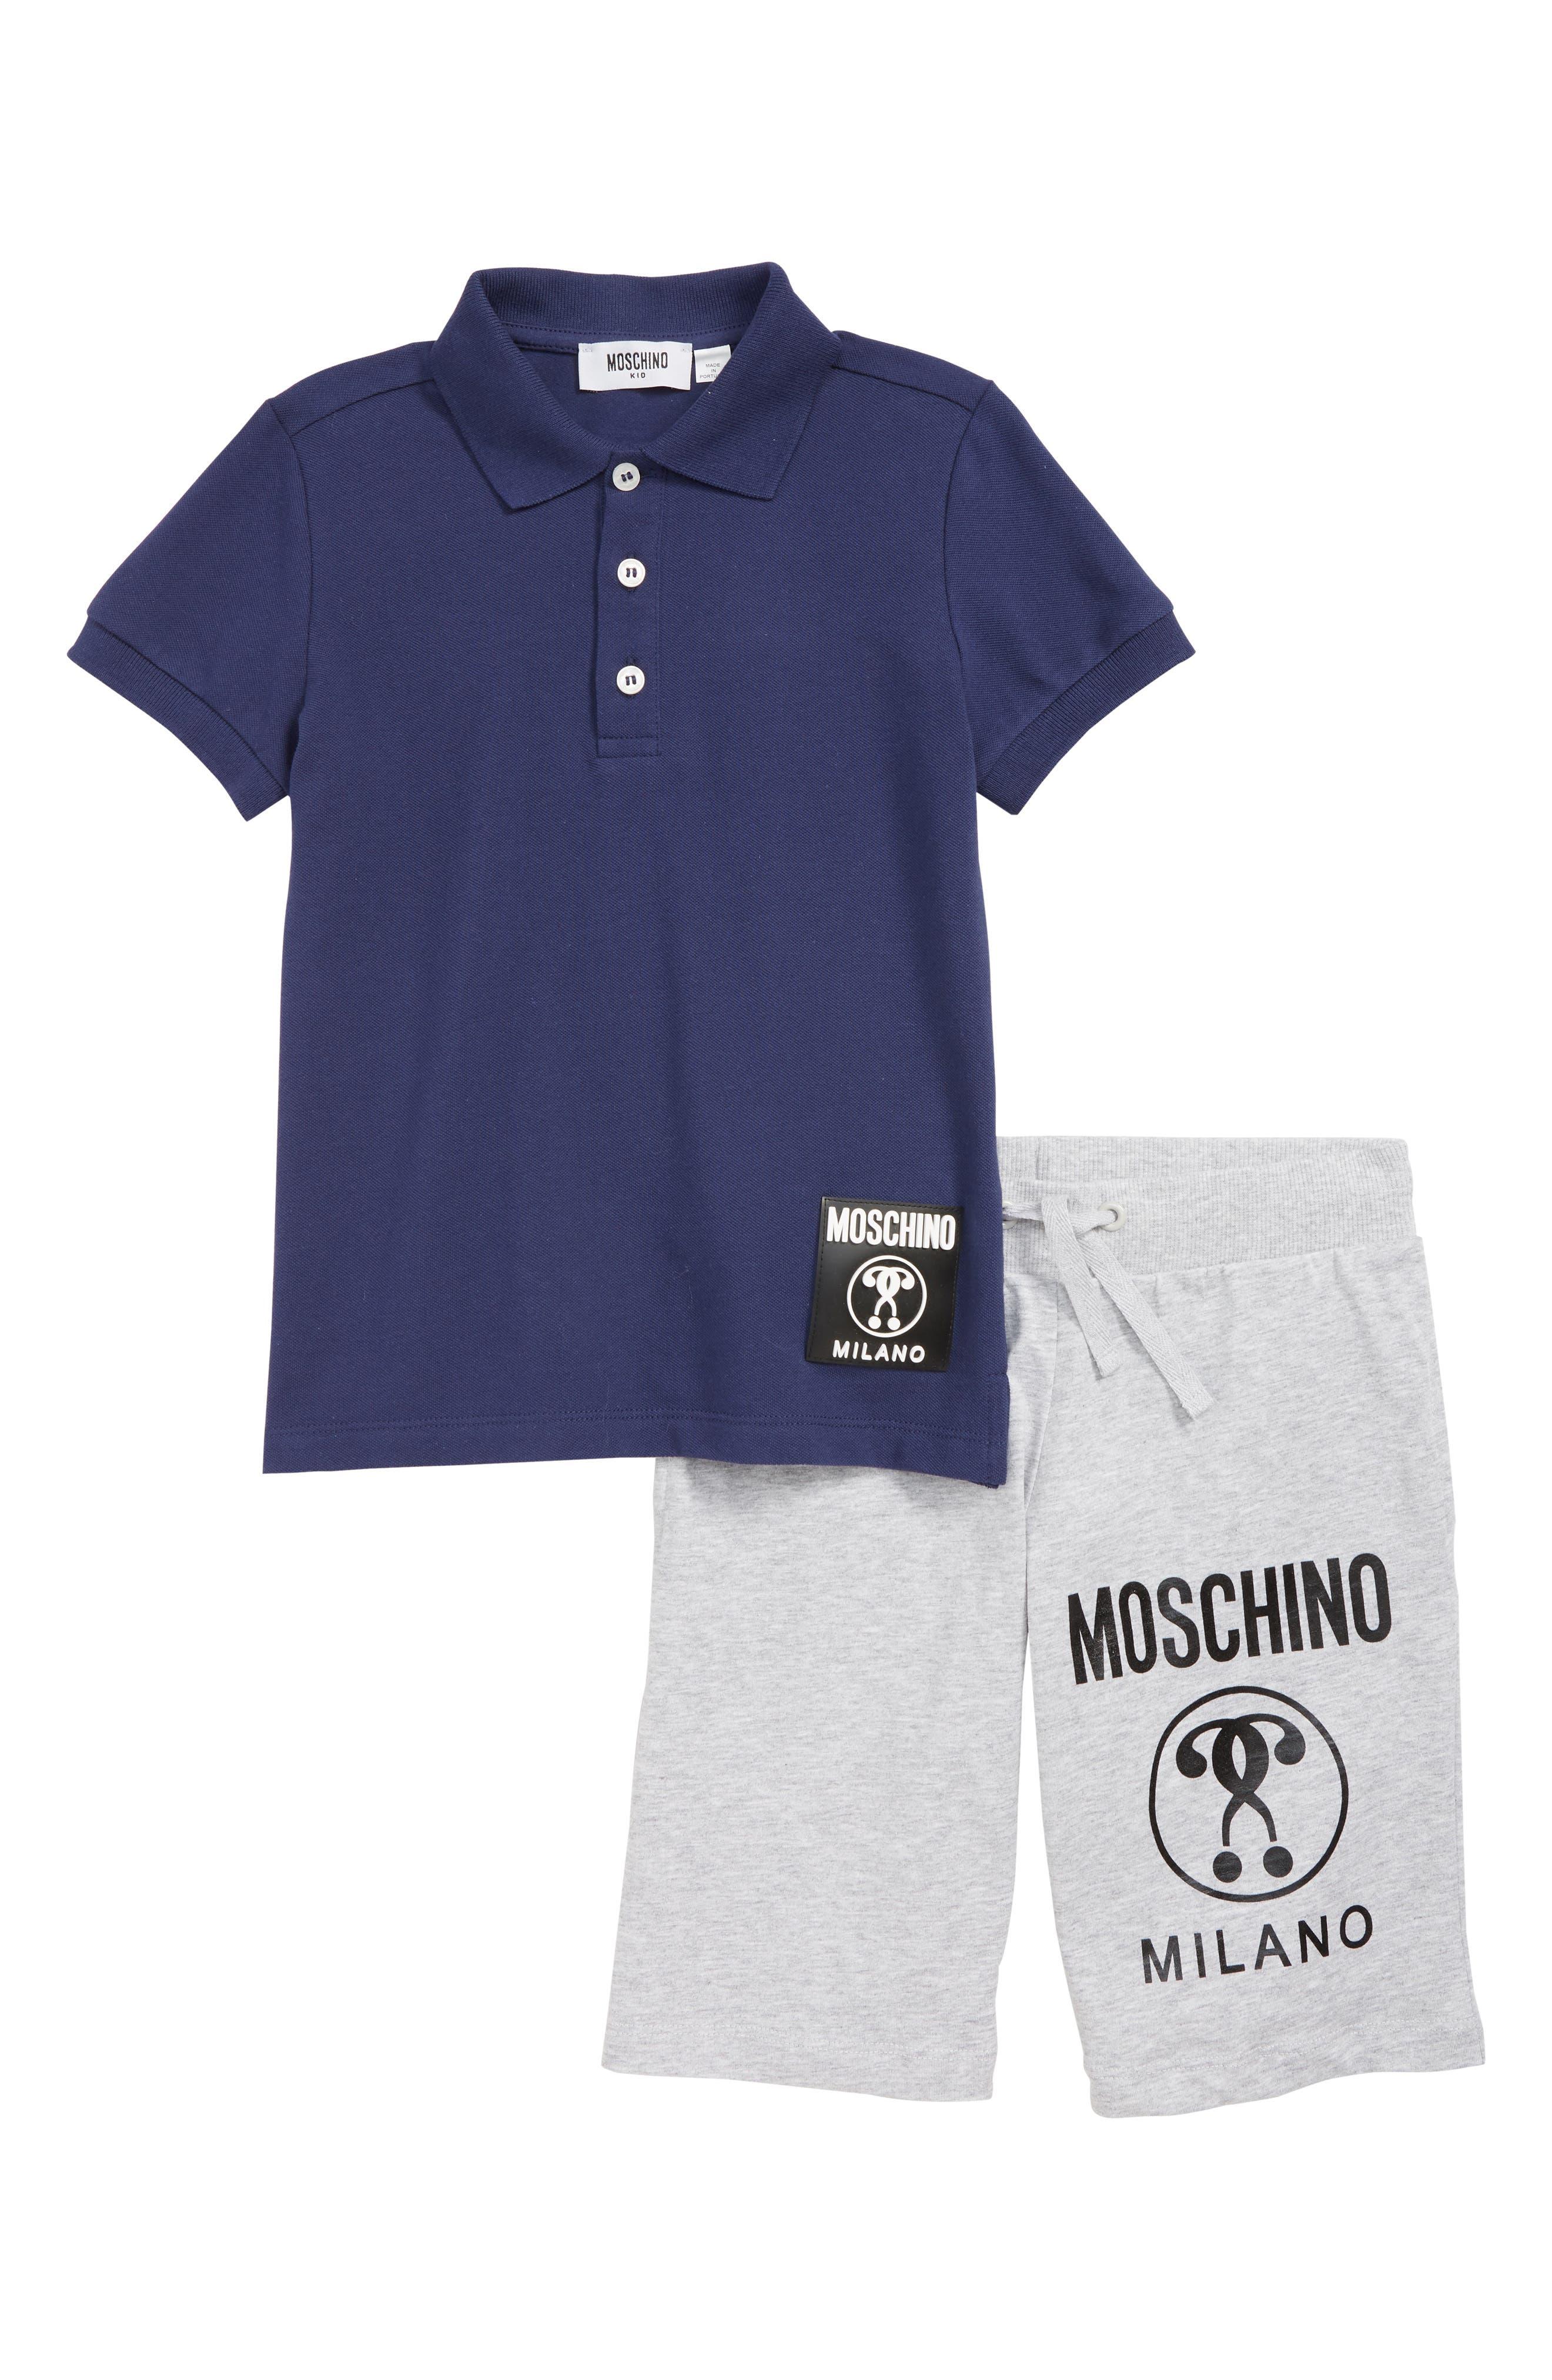 MOSCHINO Polo & Shorts Set, Main, color, BLUE/ GREY